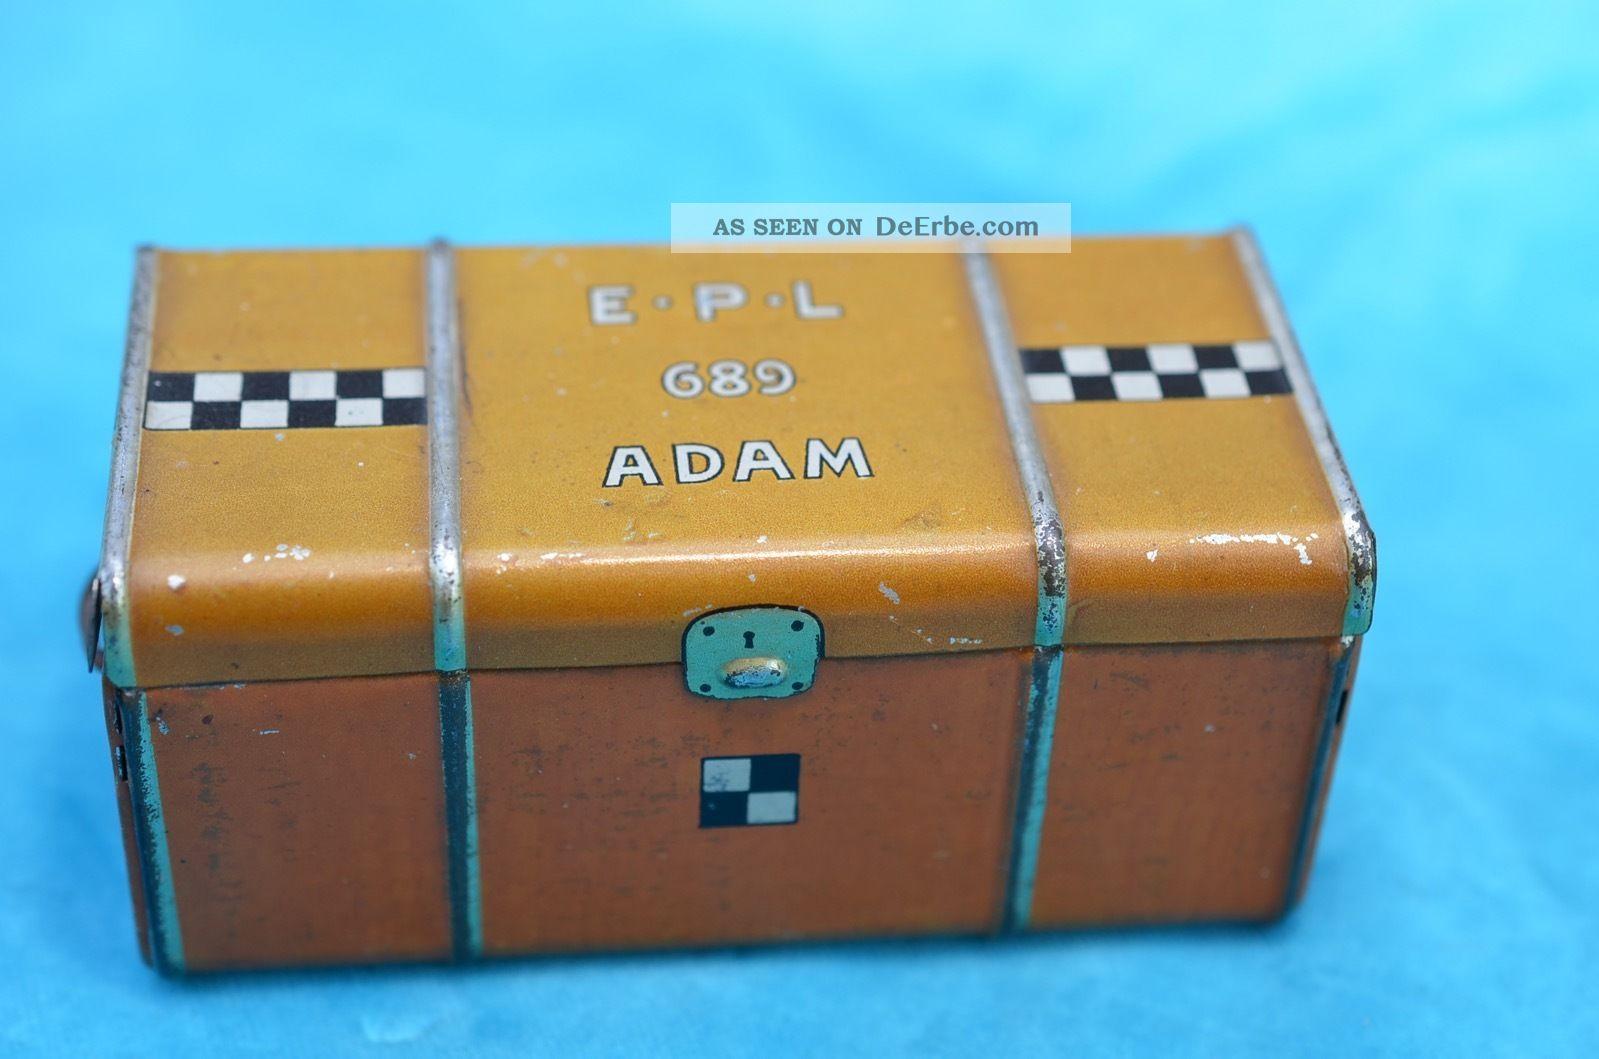 blechspielzeug lehmann epl 689 koffer f r adam kofferfahrer. Black Bedroom Furniture Sets. Home Design Ideas